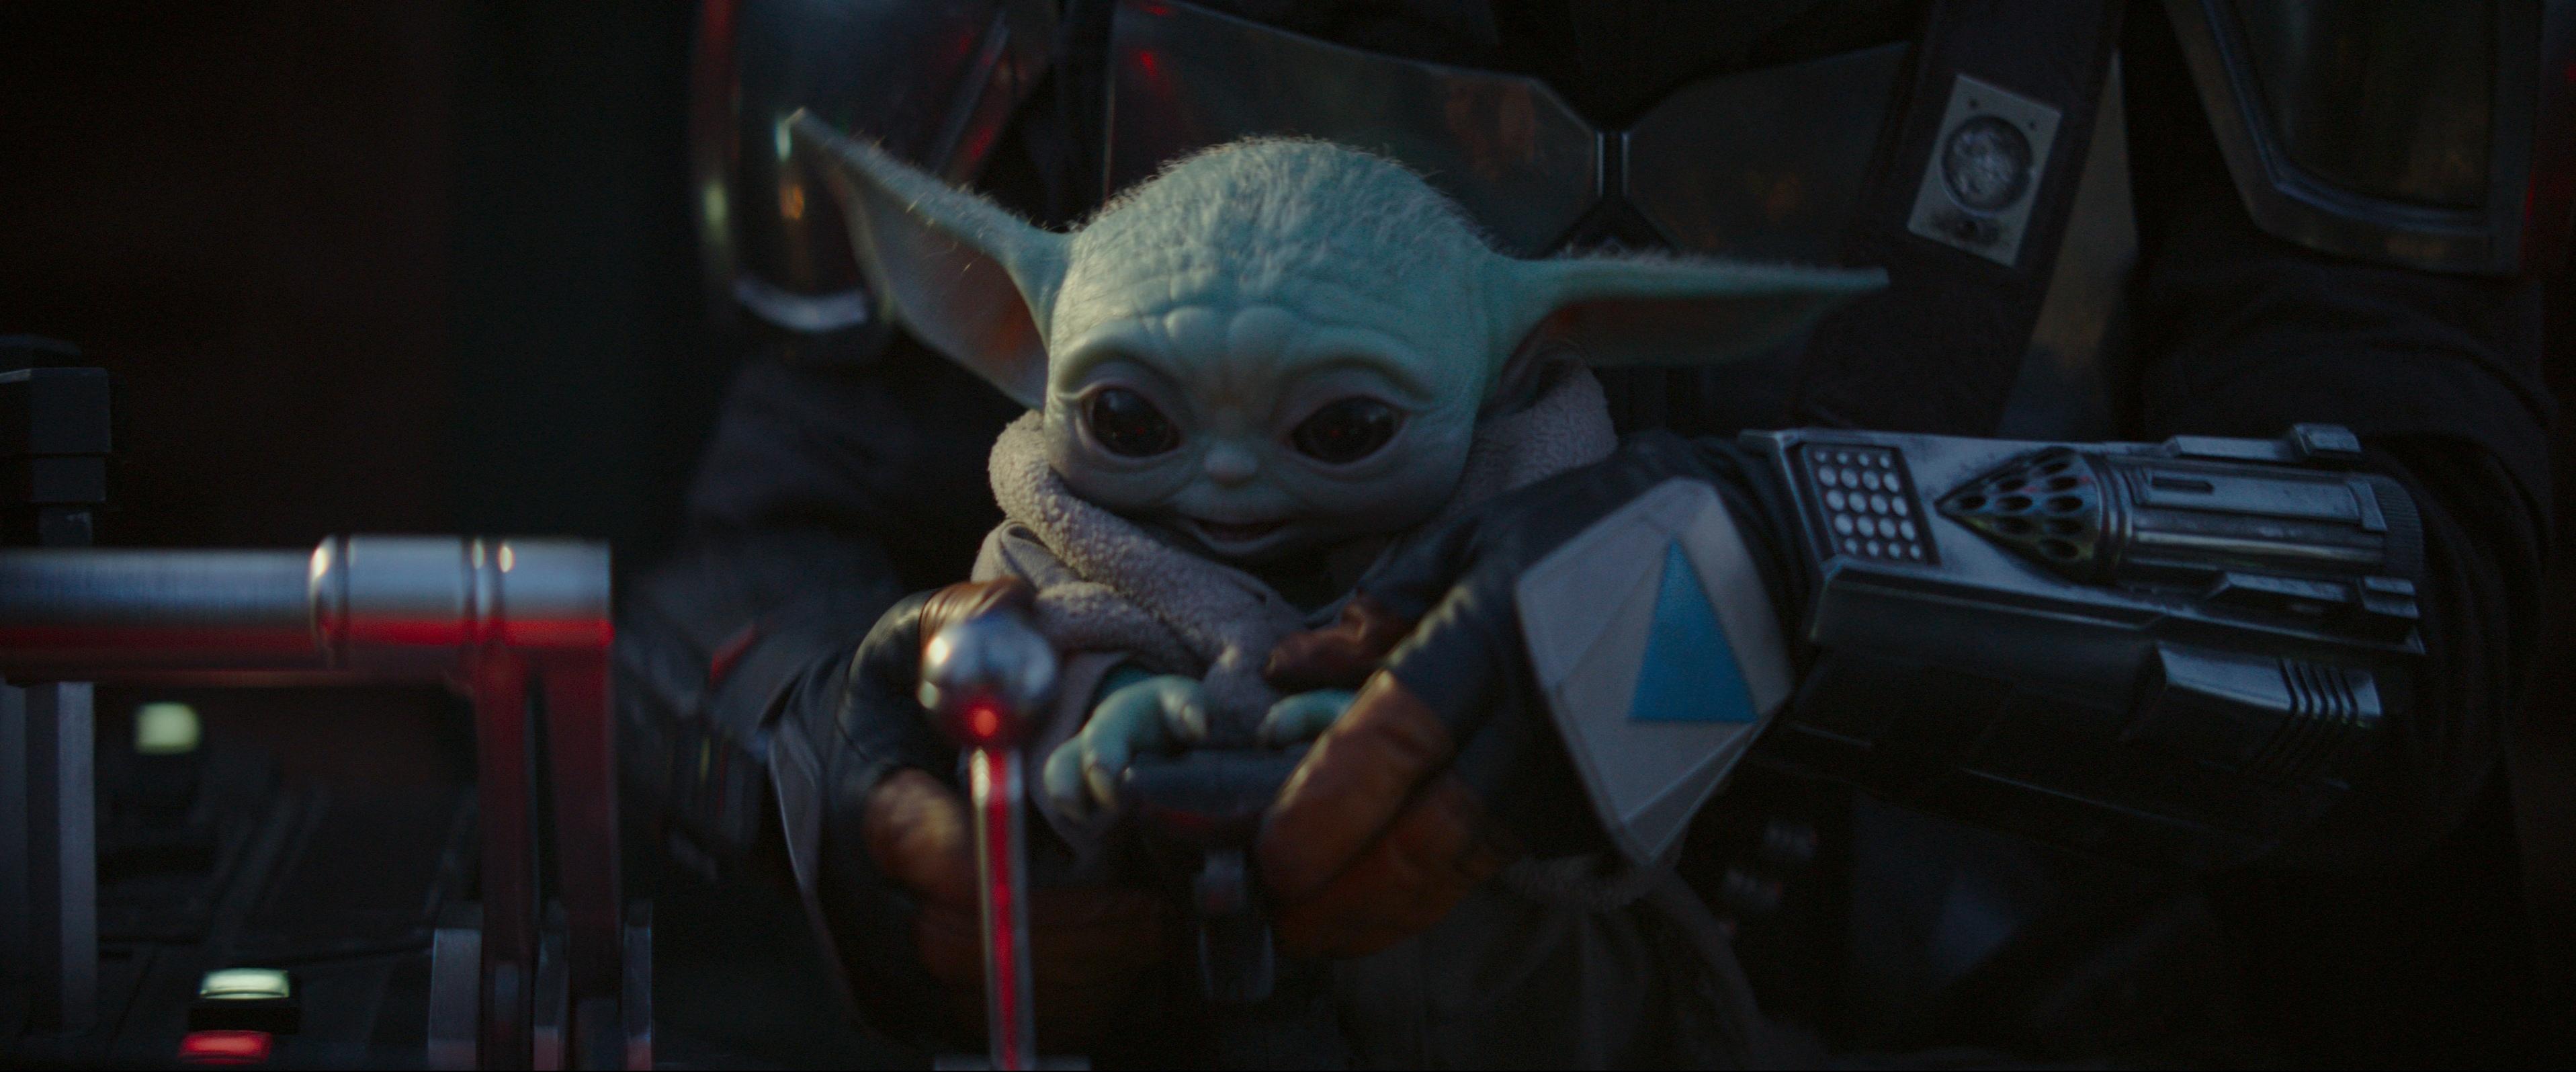 540x960169220 Baby Yoda The Mandalorian ...